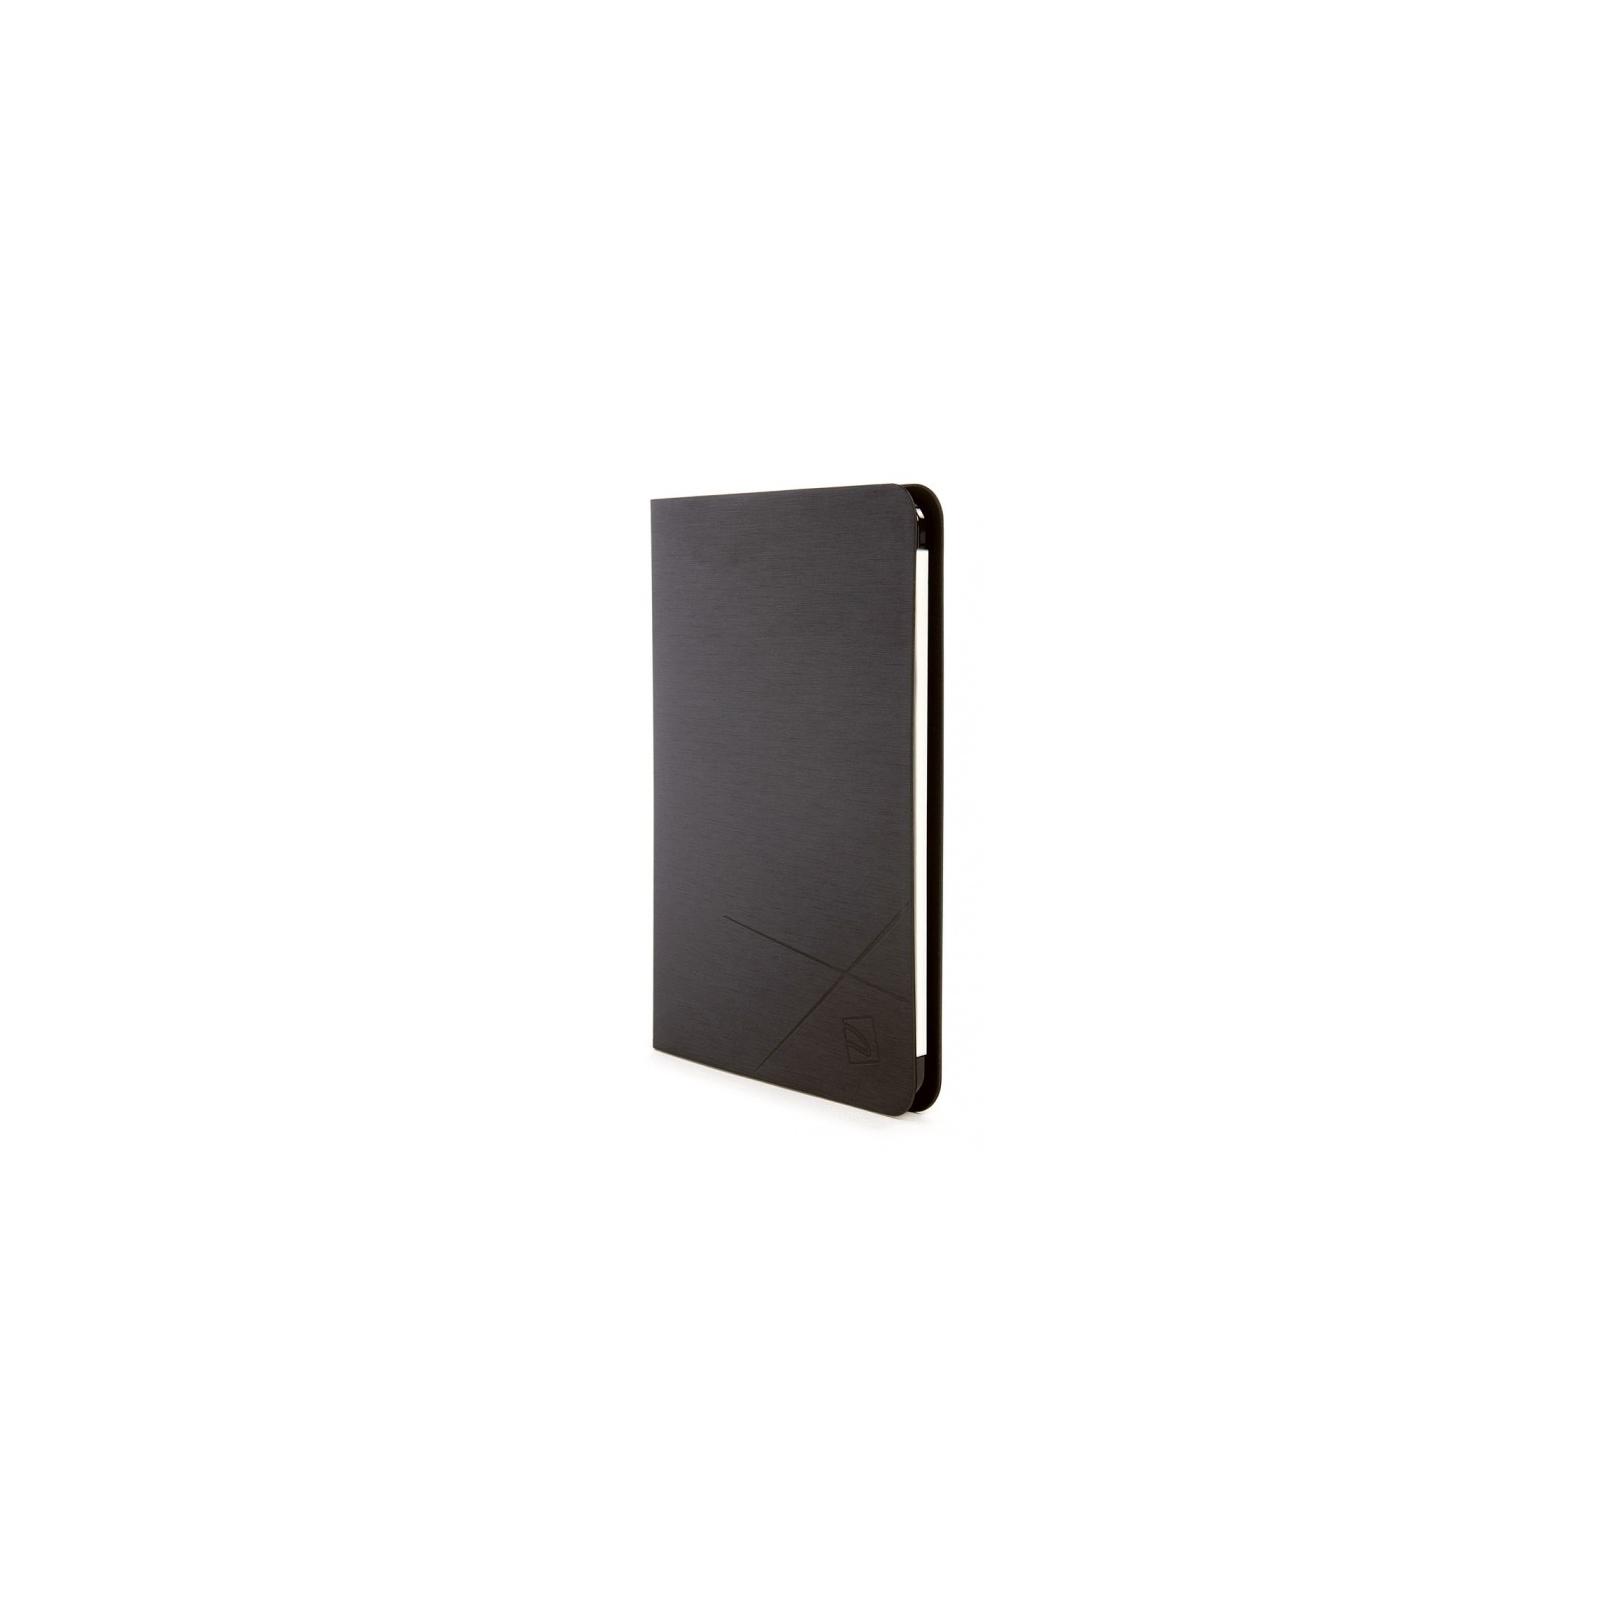 Чехол для планшета Tucano iPad Air Filo Black (IPD5FI) изображение 3